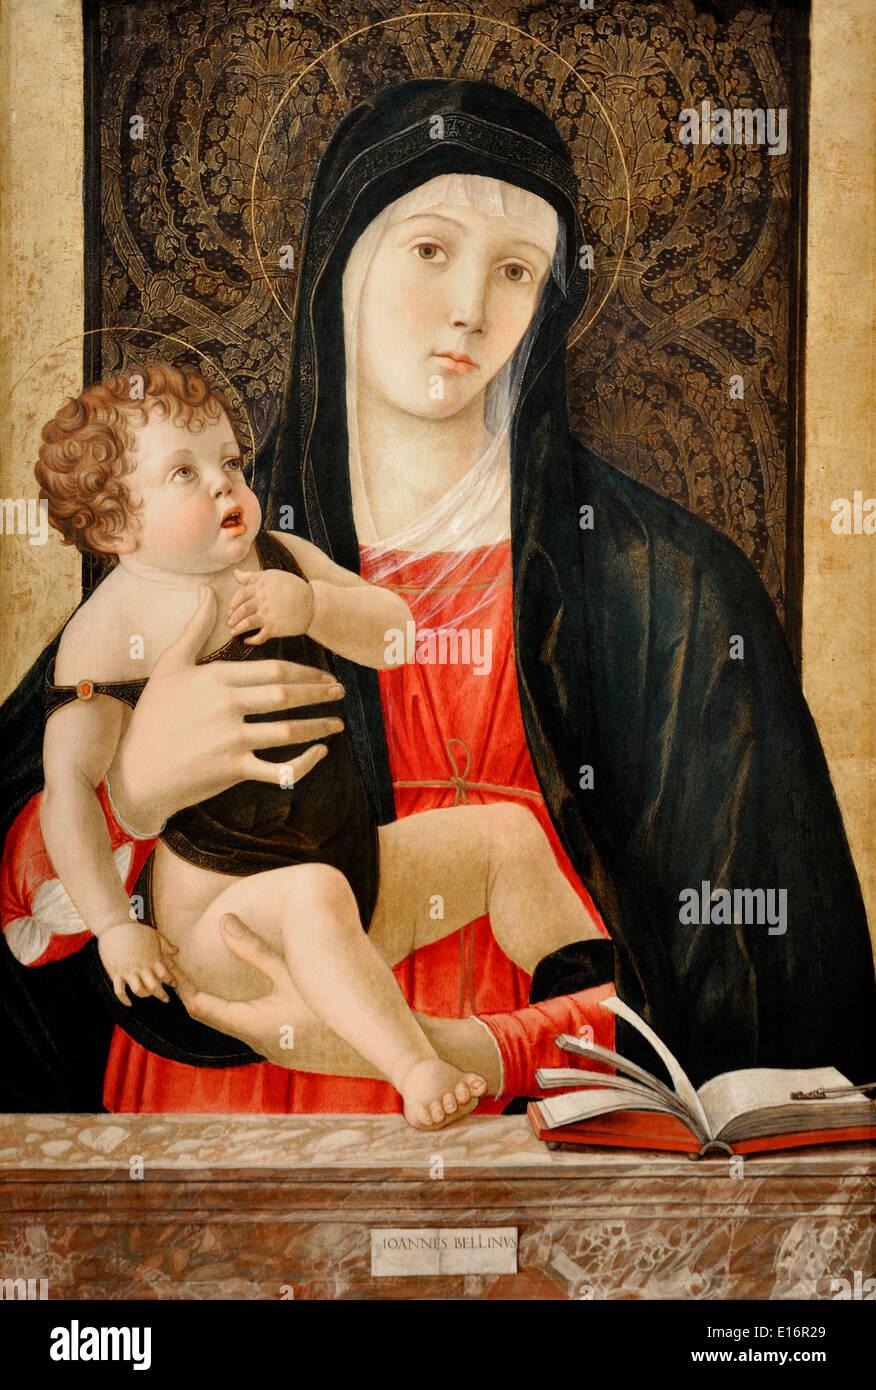 Madonna by Giovanni Bellini, 1465 - Stock Image